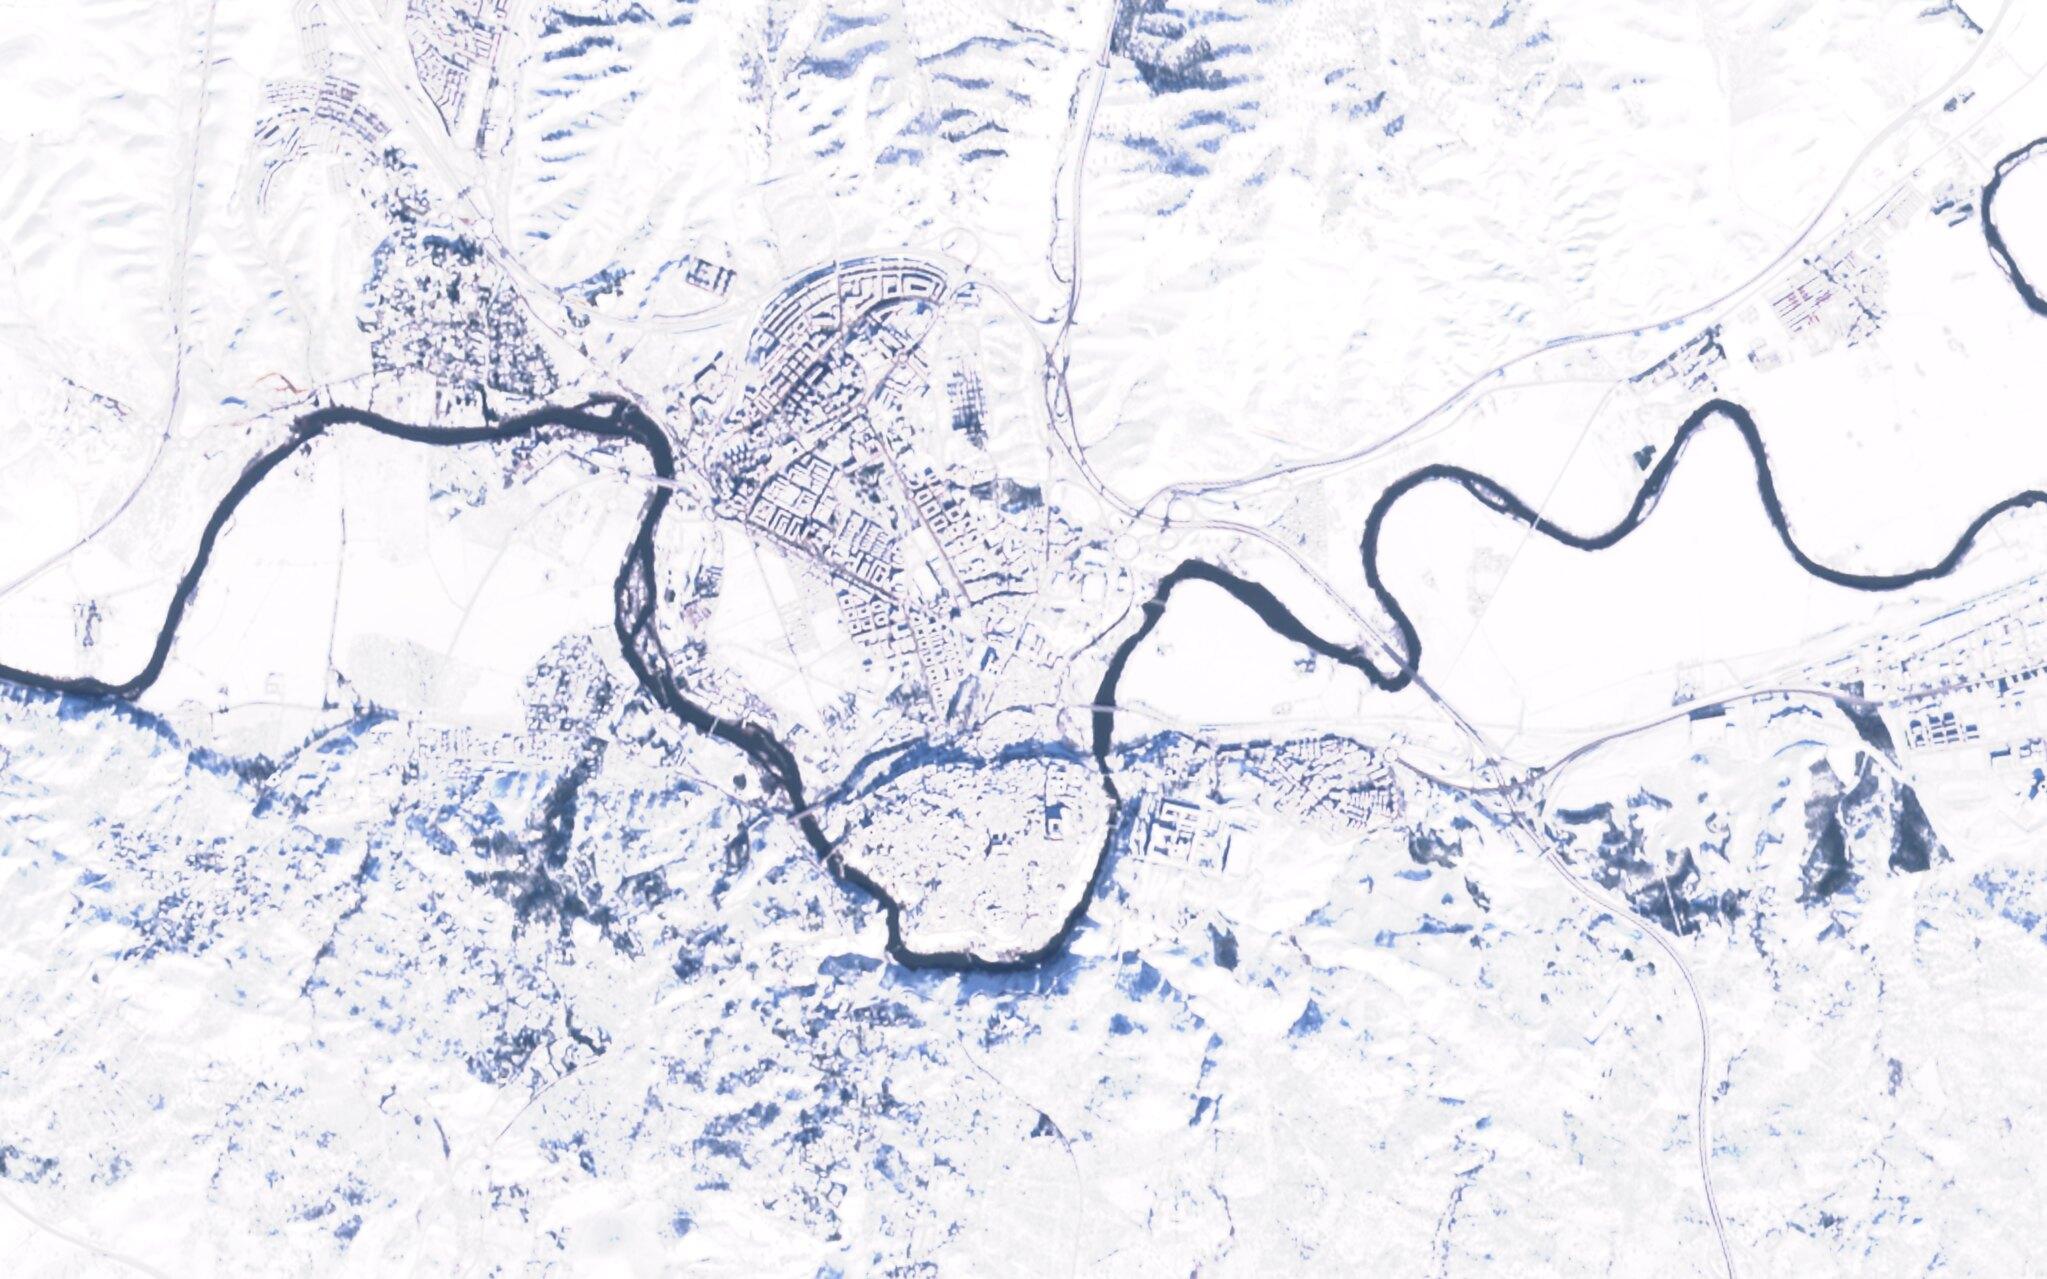 Toledo y Filomena, 11-01-2021